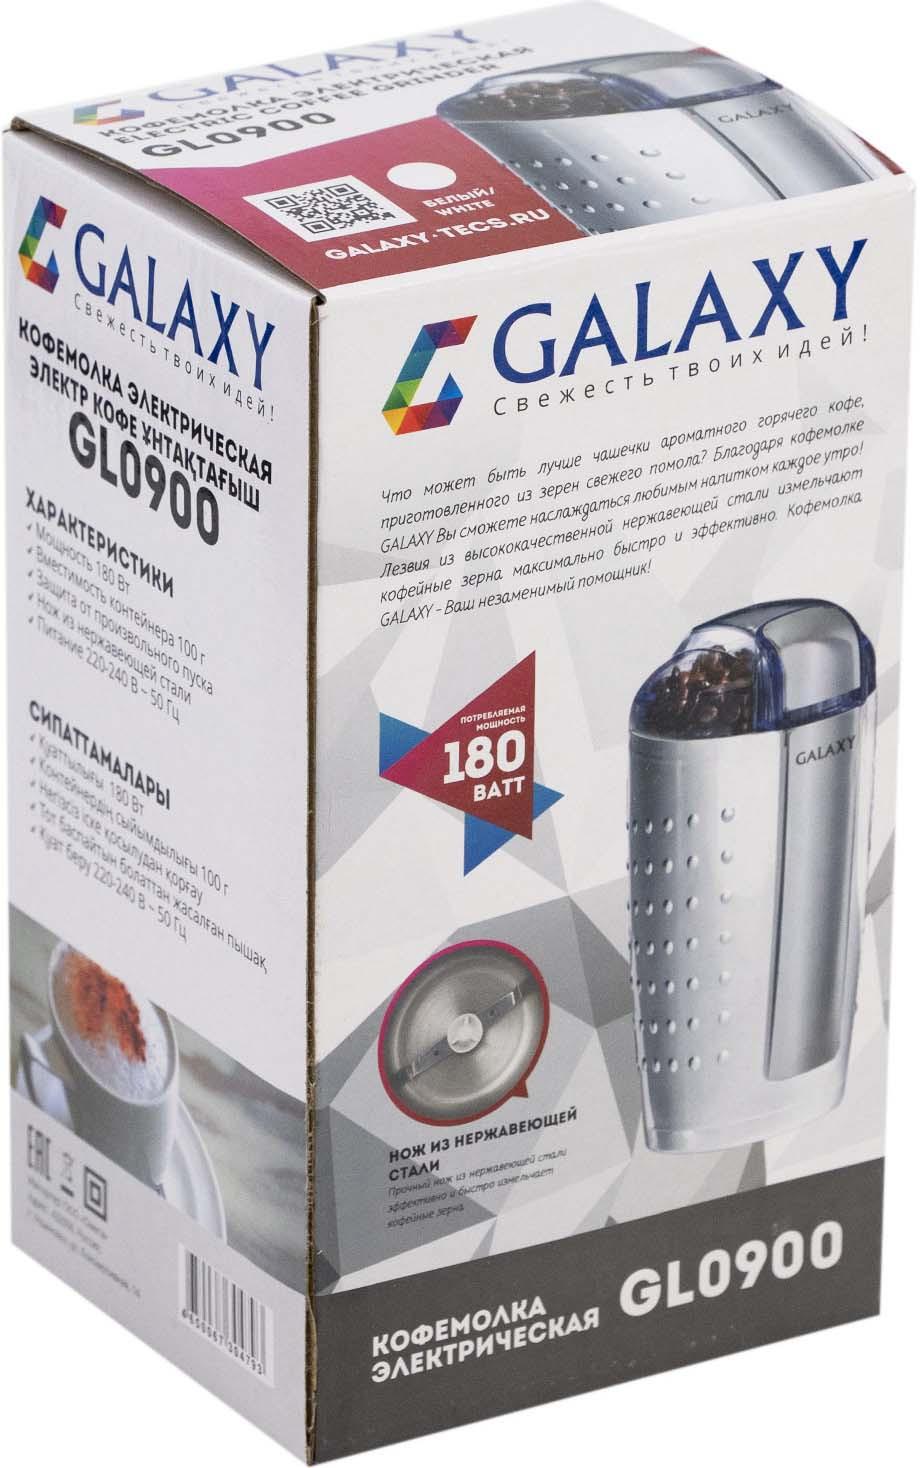 Кофемолка Galaxy GL 0900, цвет: белый, серебристый Galaxy